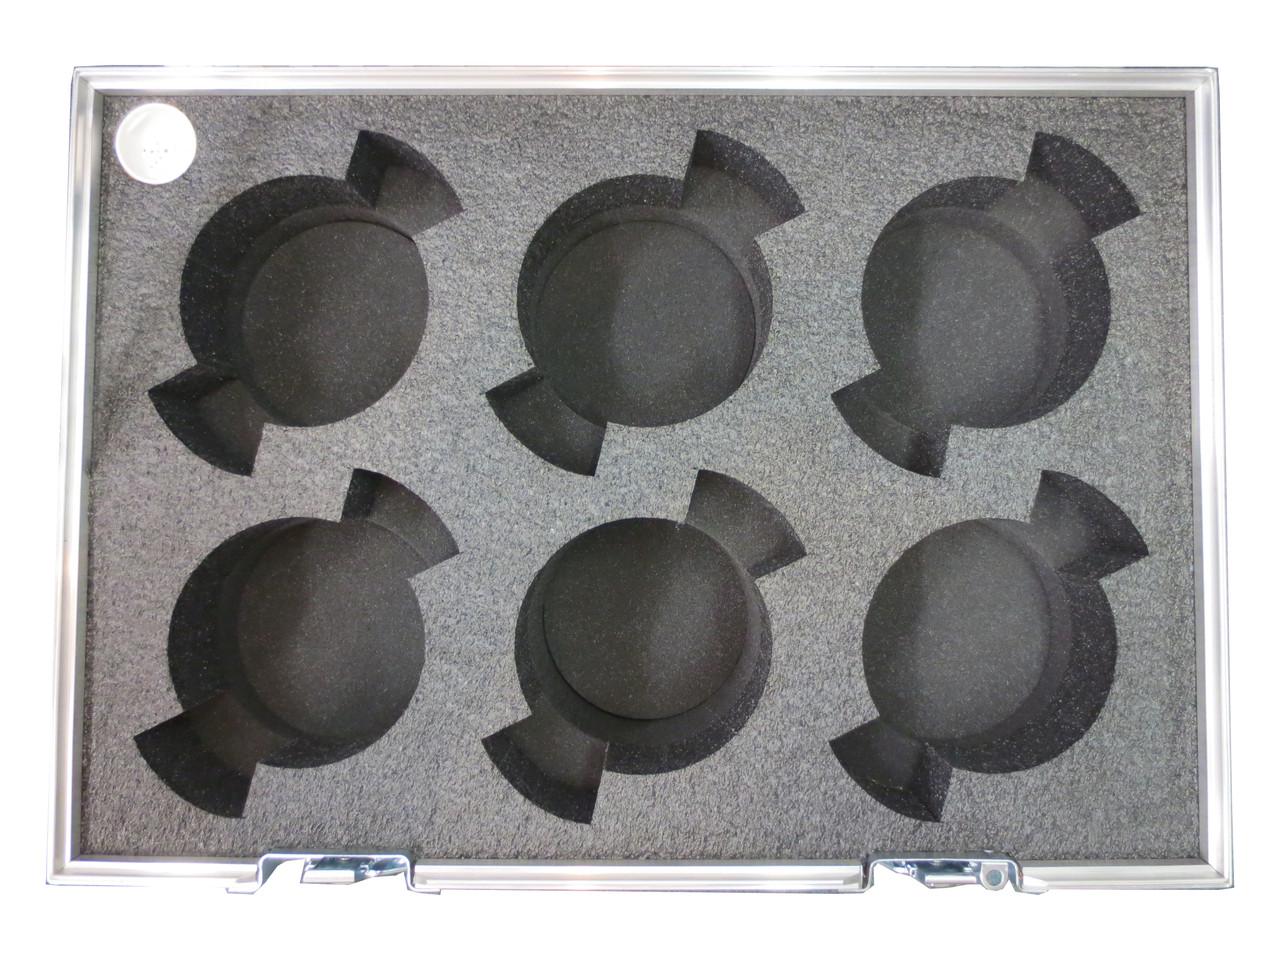 Arri Master Prime Lens (6 Position) Custom ATA Shipping Case